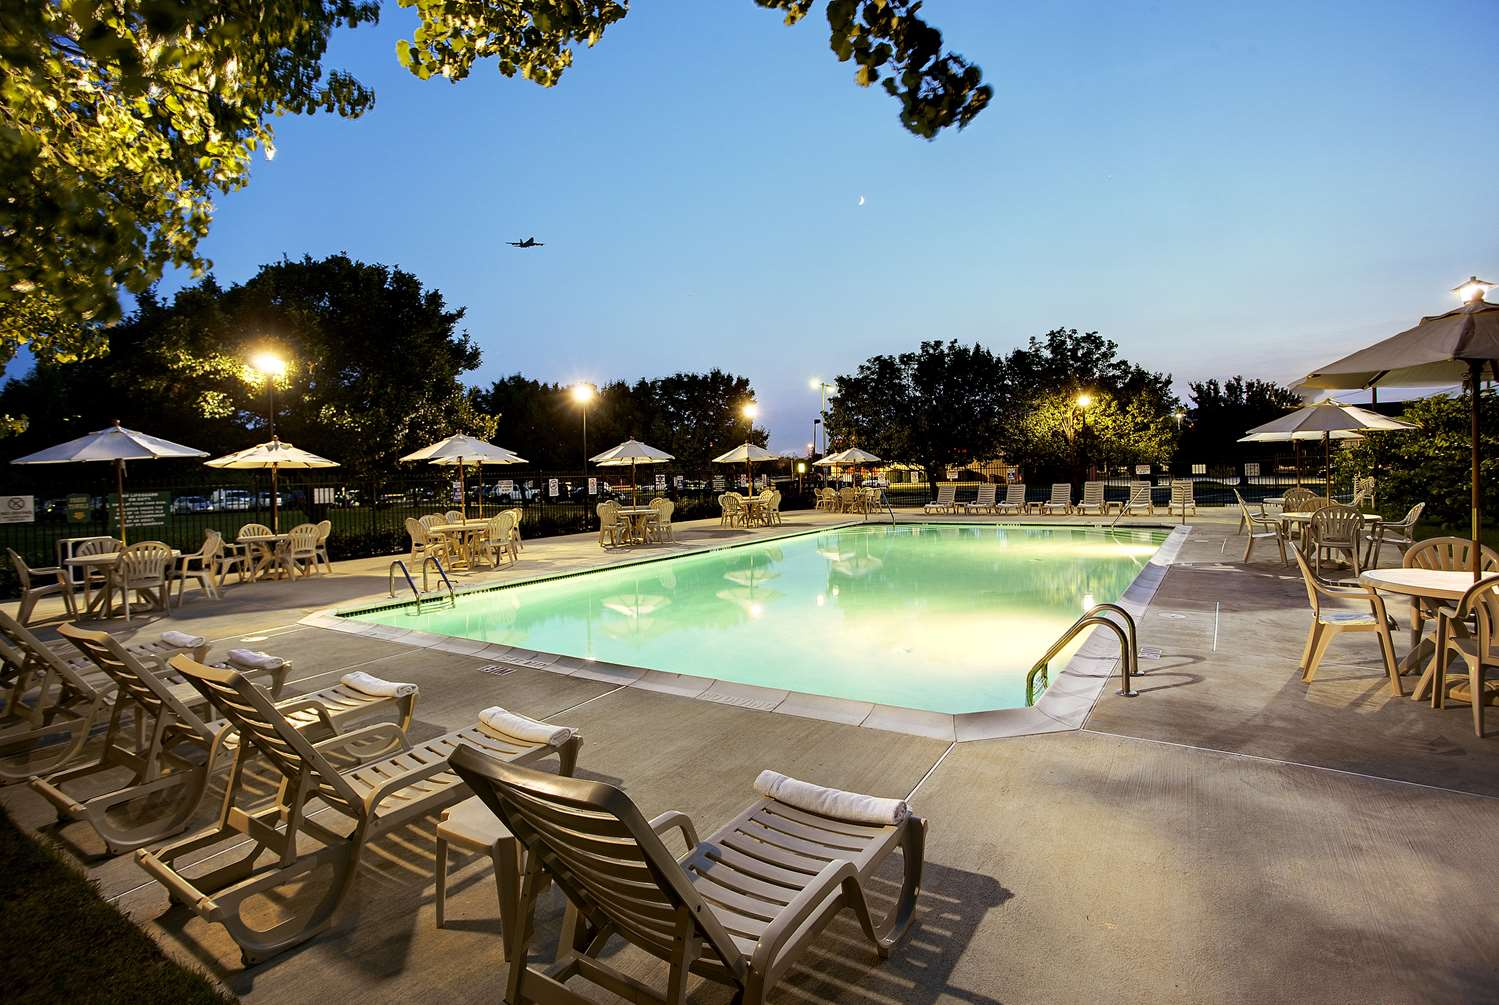 Pool - Wyndham Garden Hotel Airport Essington